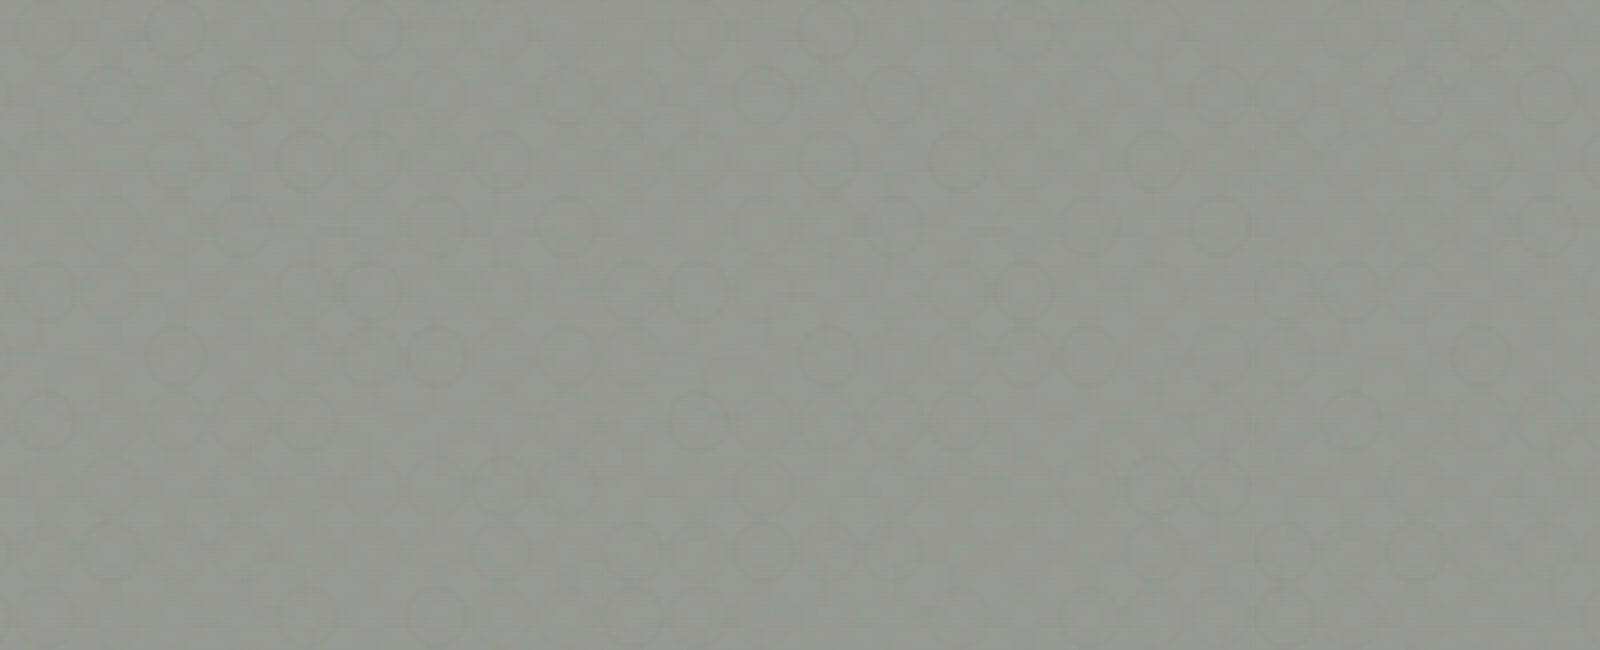 Gray swirls background